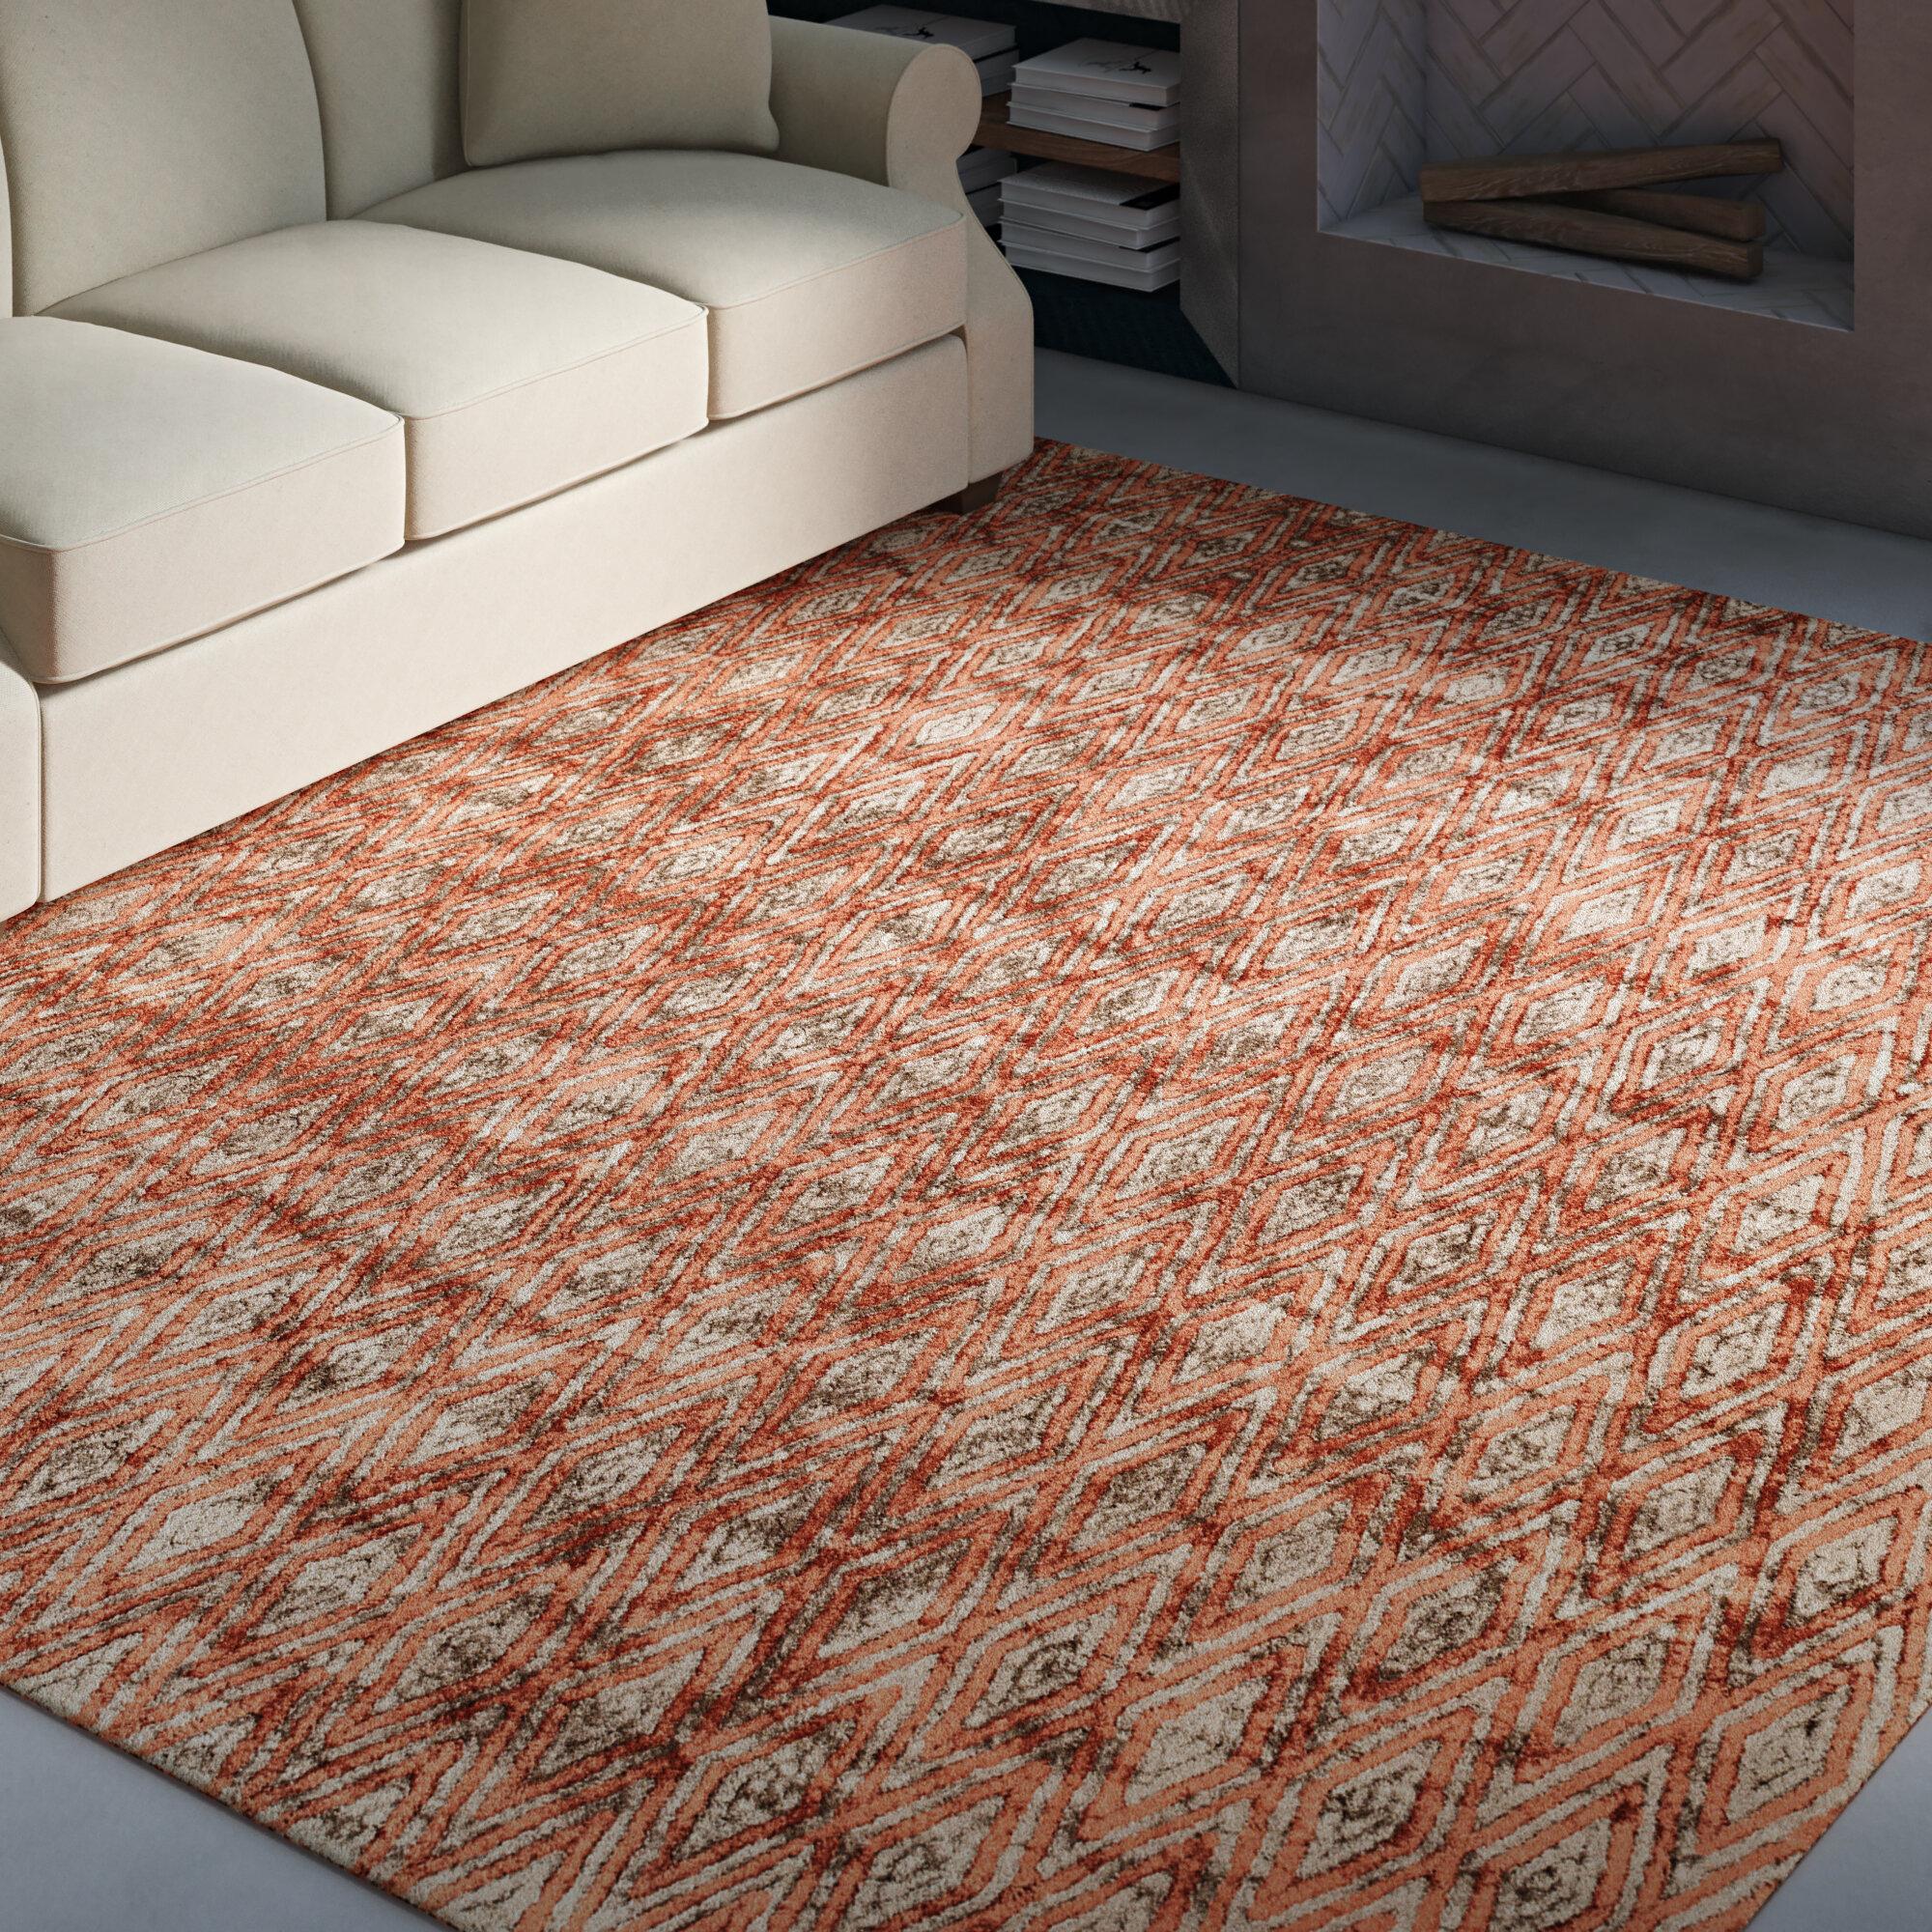 Greyleigh Brashear Geometric Handmade Tufted Rust Orange Area Rug Reviews Wayfair